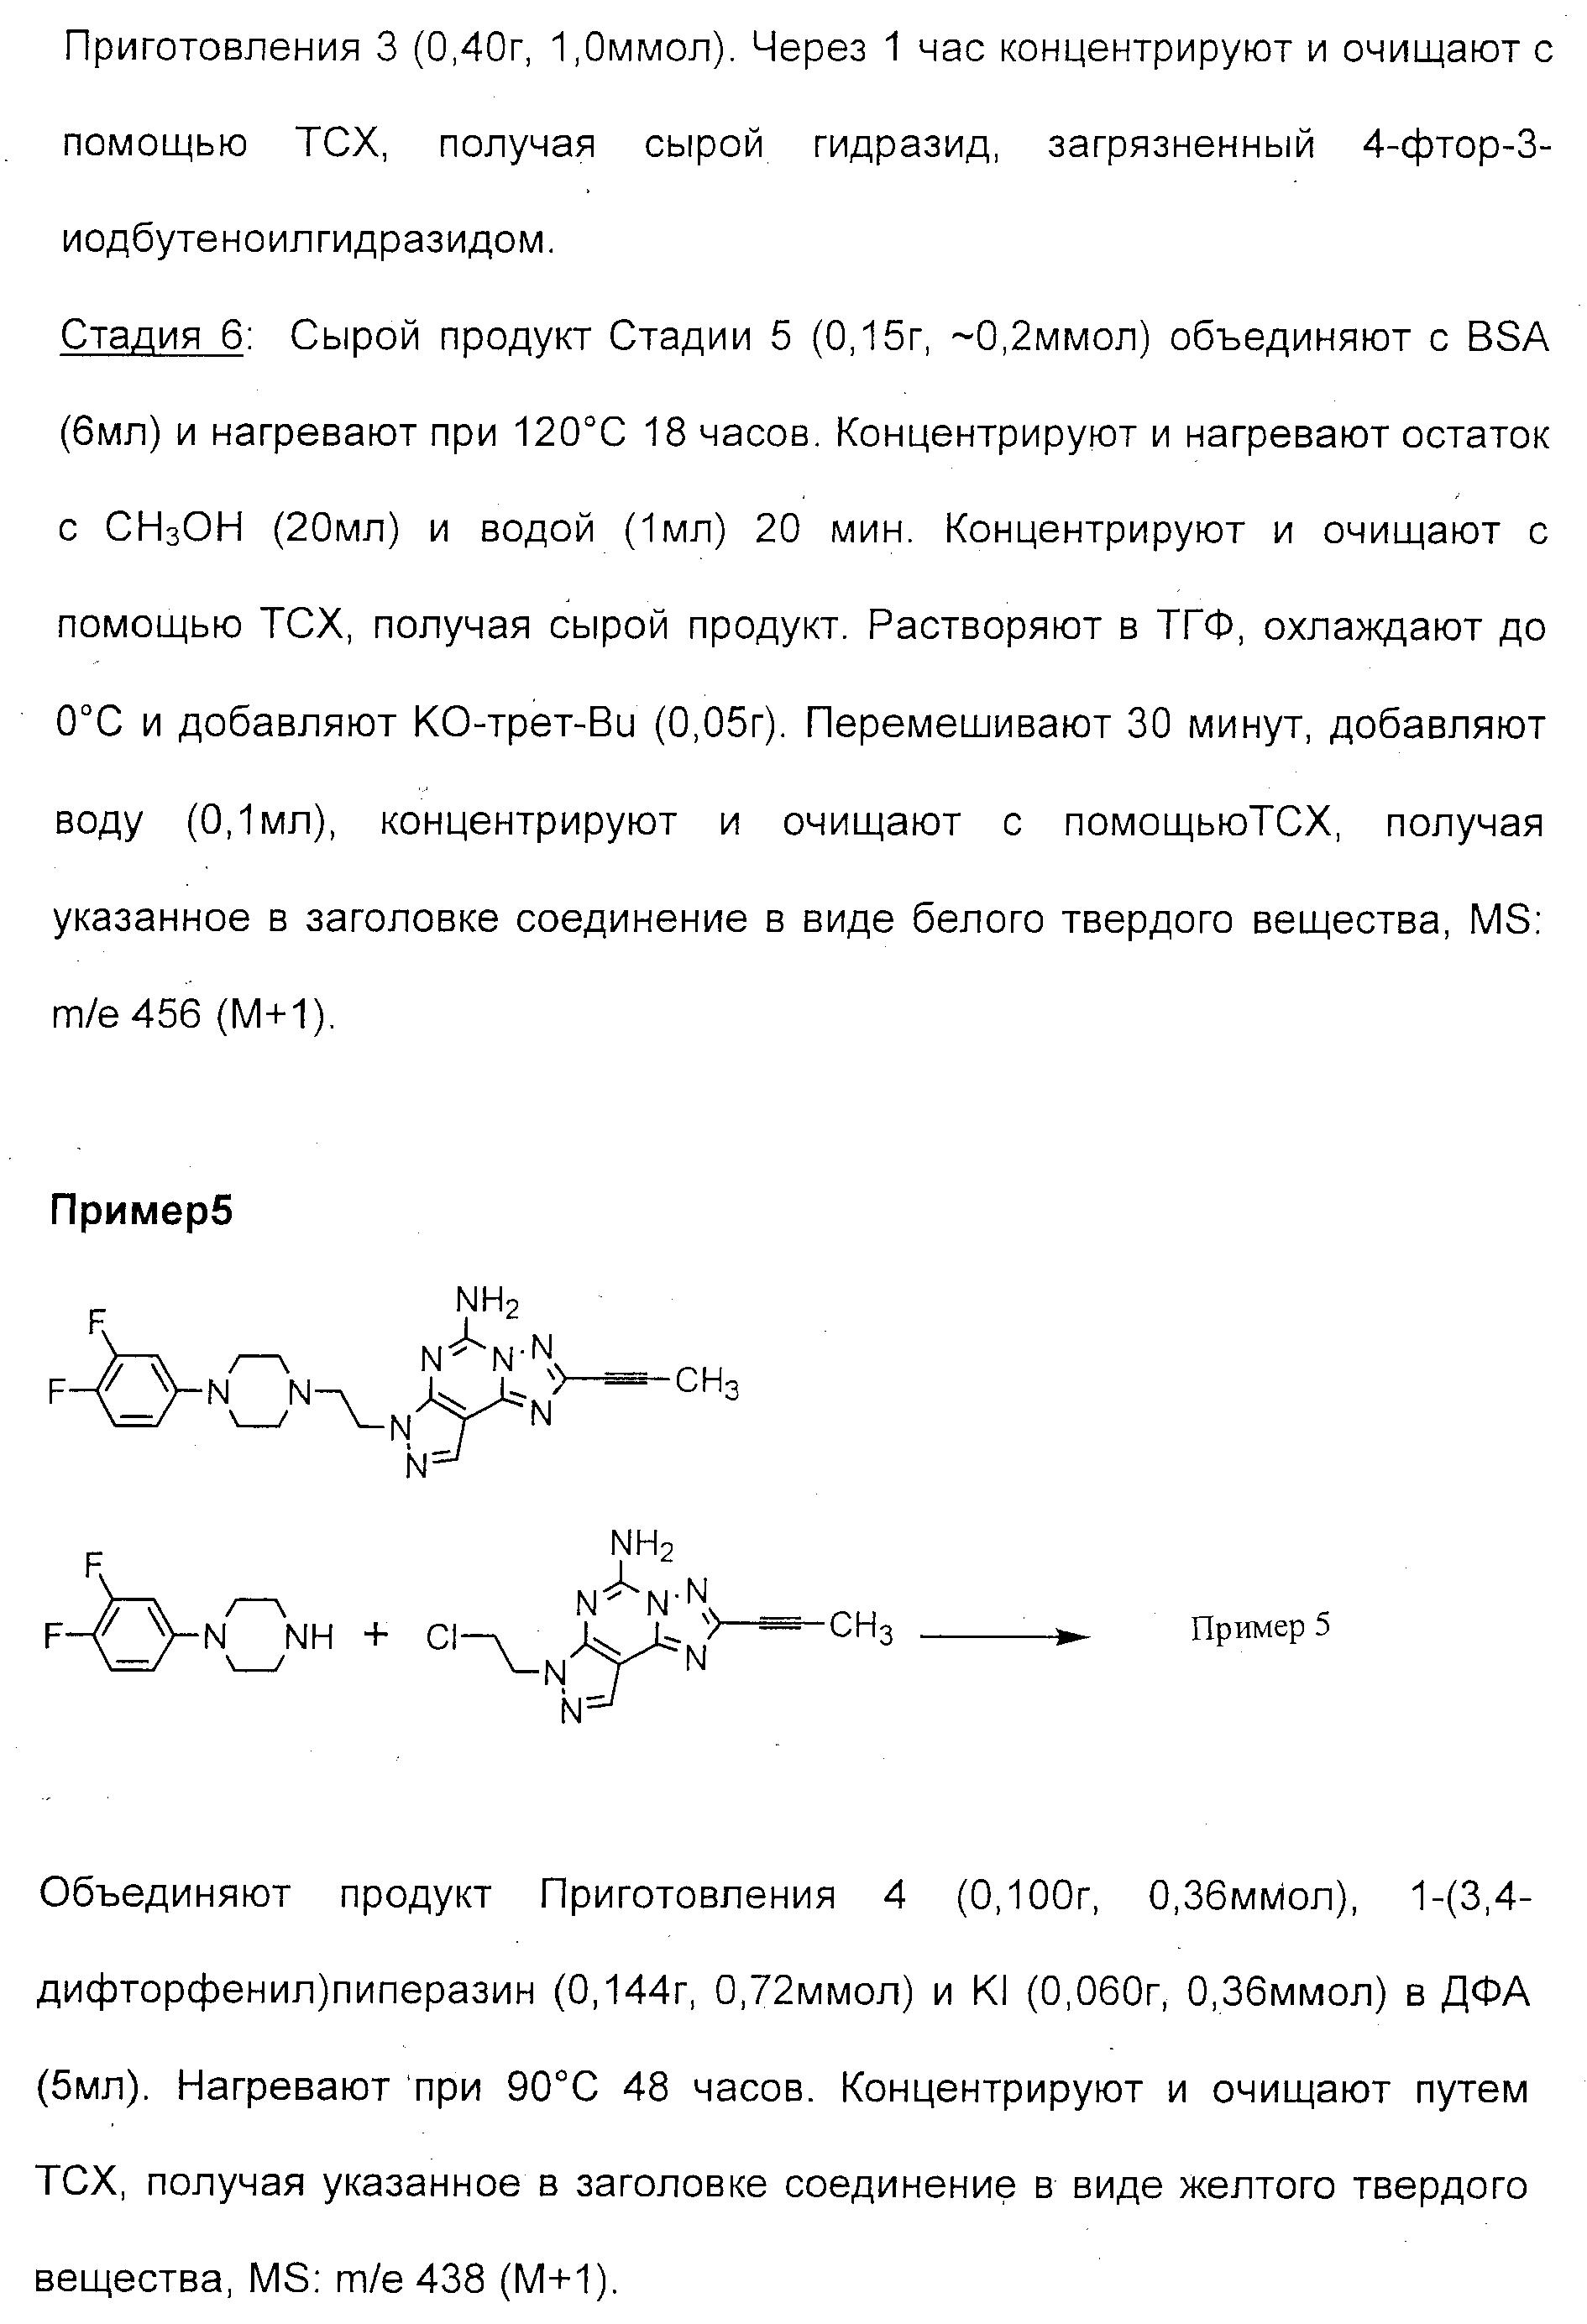 Figure 00000122